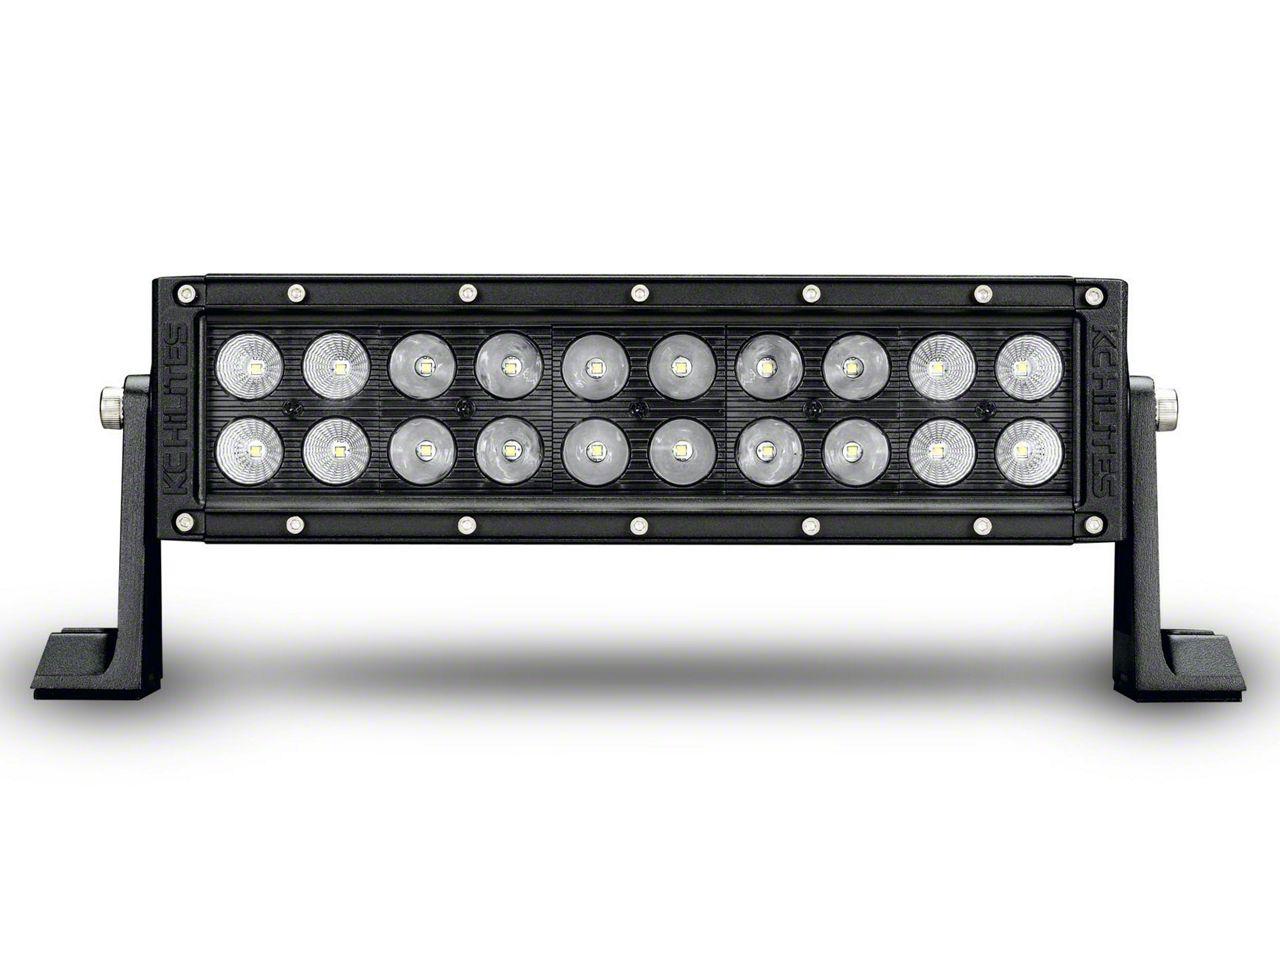 KC HiLiTES 10 in C-Series C10 LED Light Bar - Combo Beam